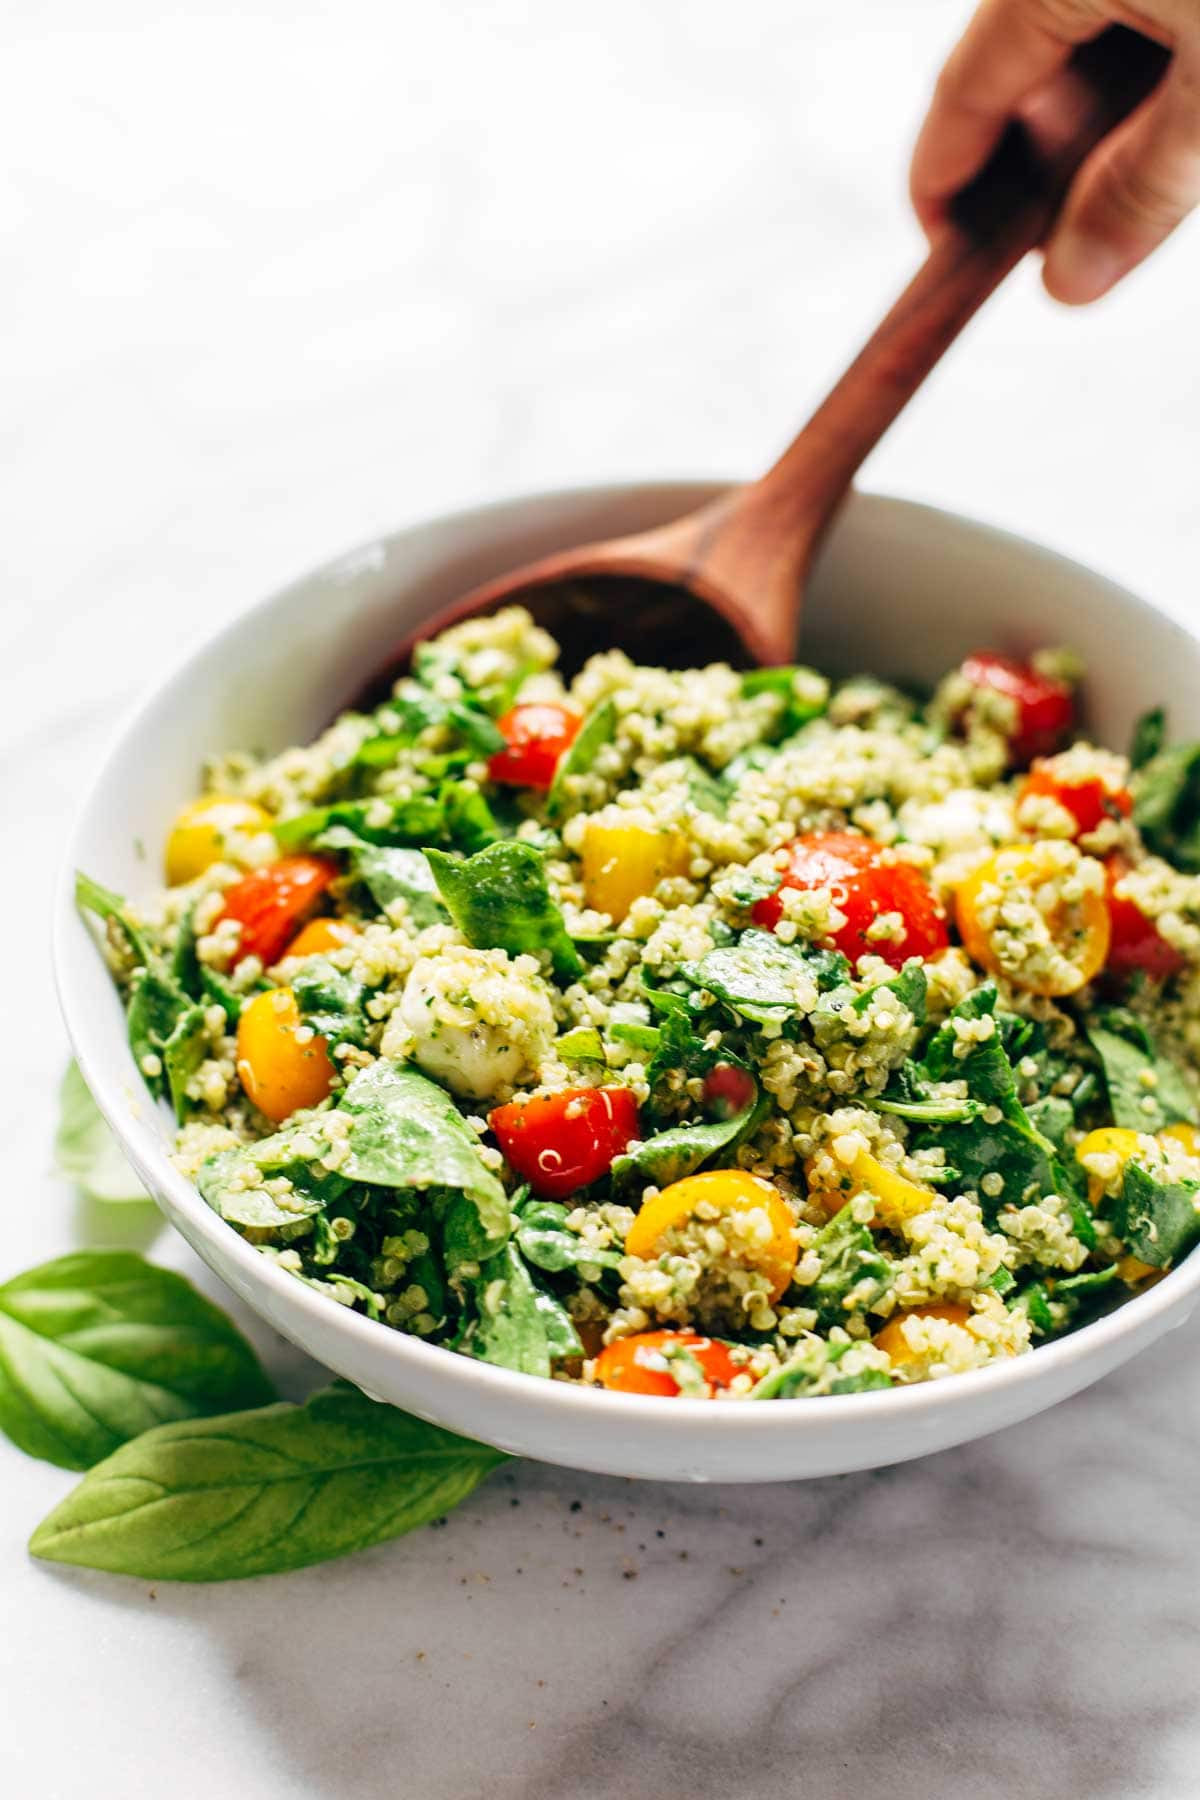 Vegetarian Recipes For Summer  Green Goddess Quinoa Summer Salad Recipe Pinch of Yum